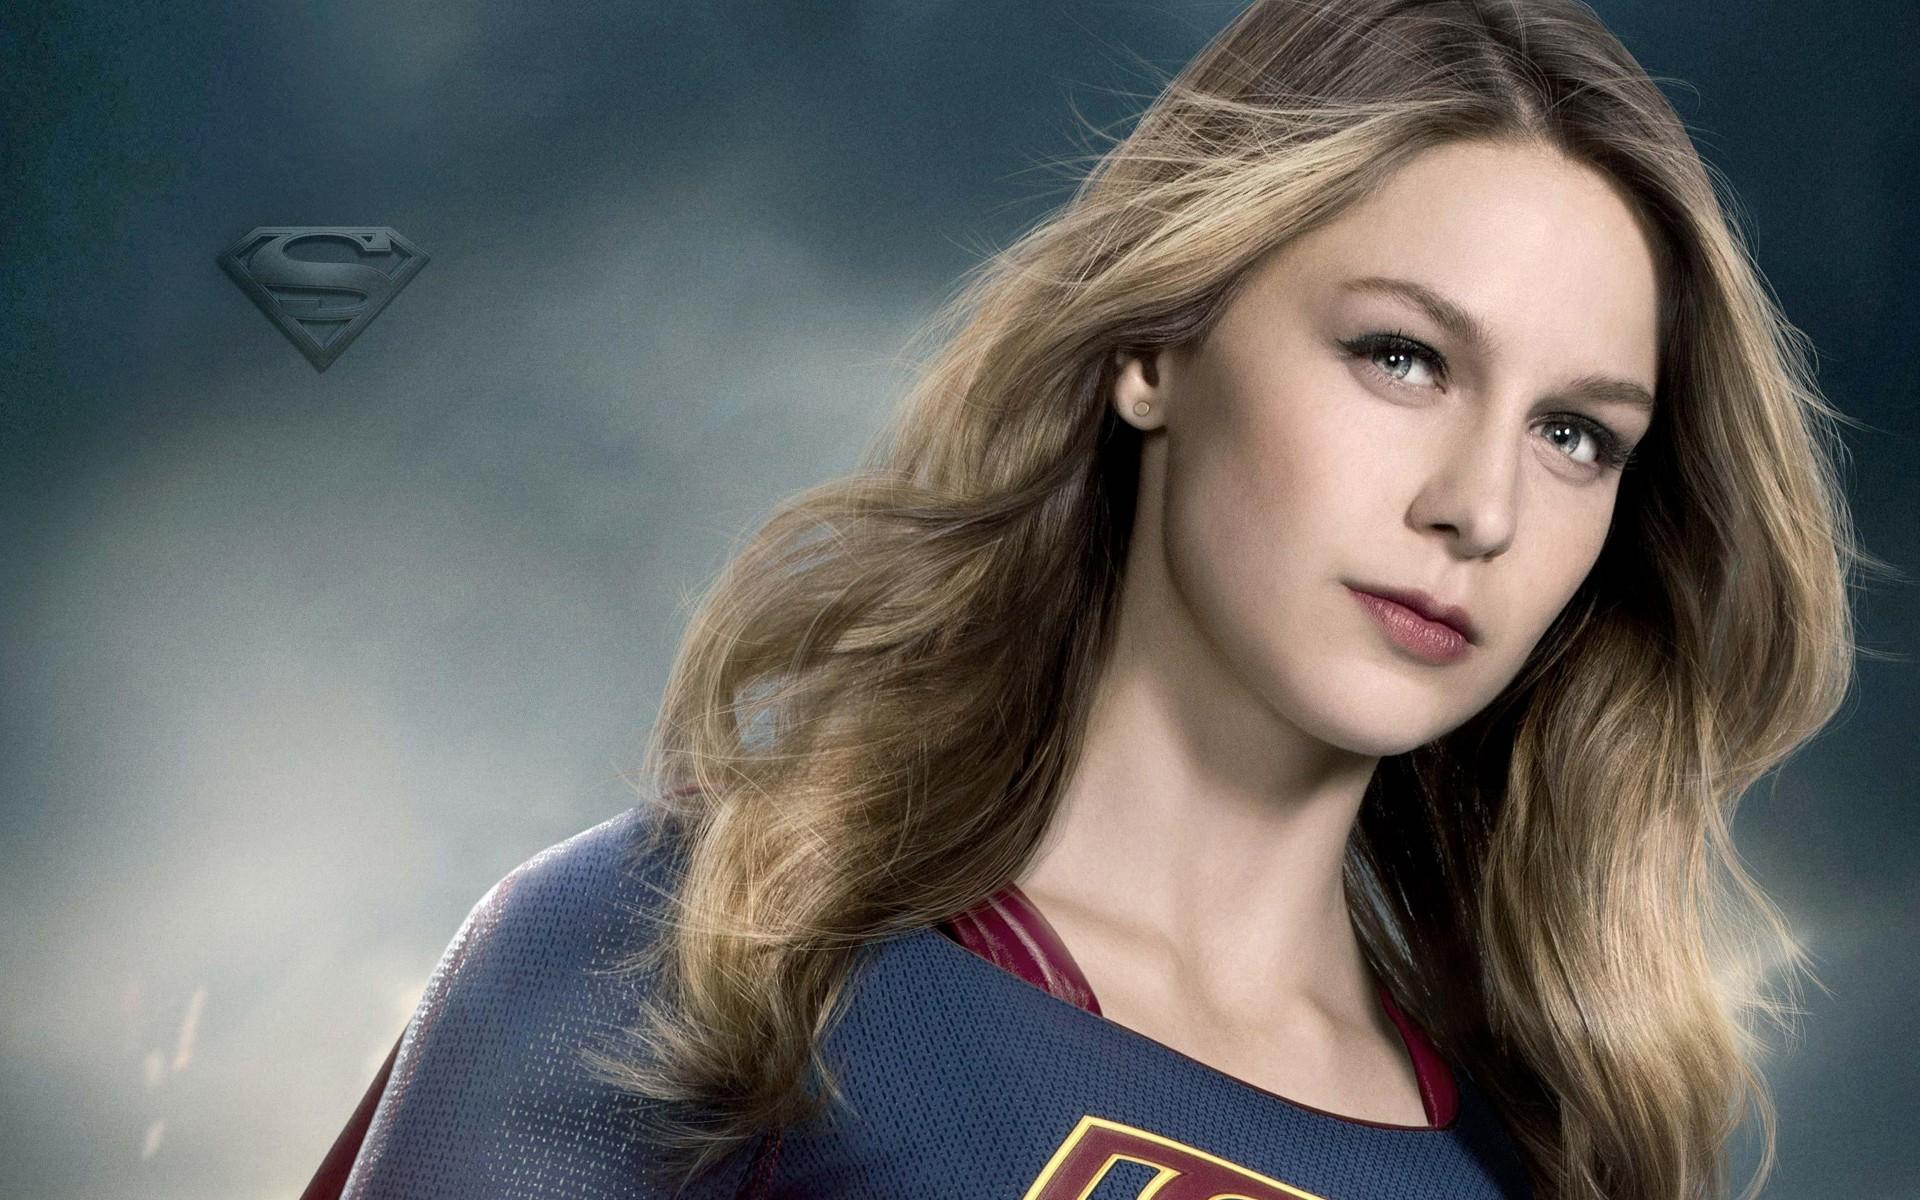 Wallpaper Wide Hd Girl Supergirl Melissa Benoist Season 2 Wallpapers Hd